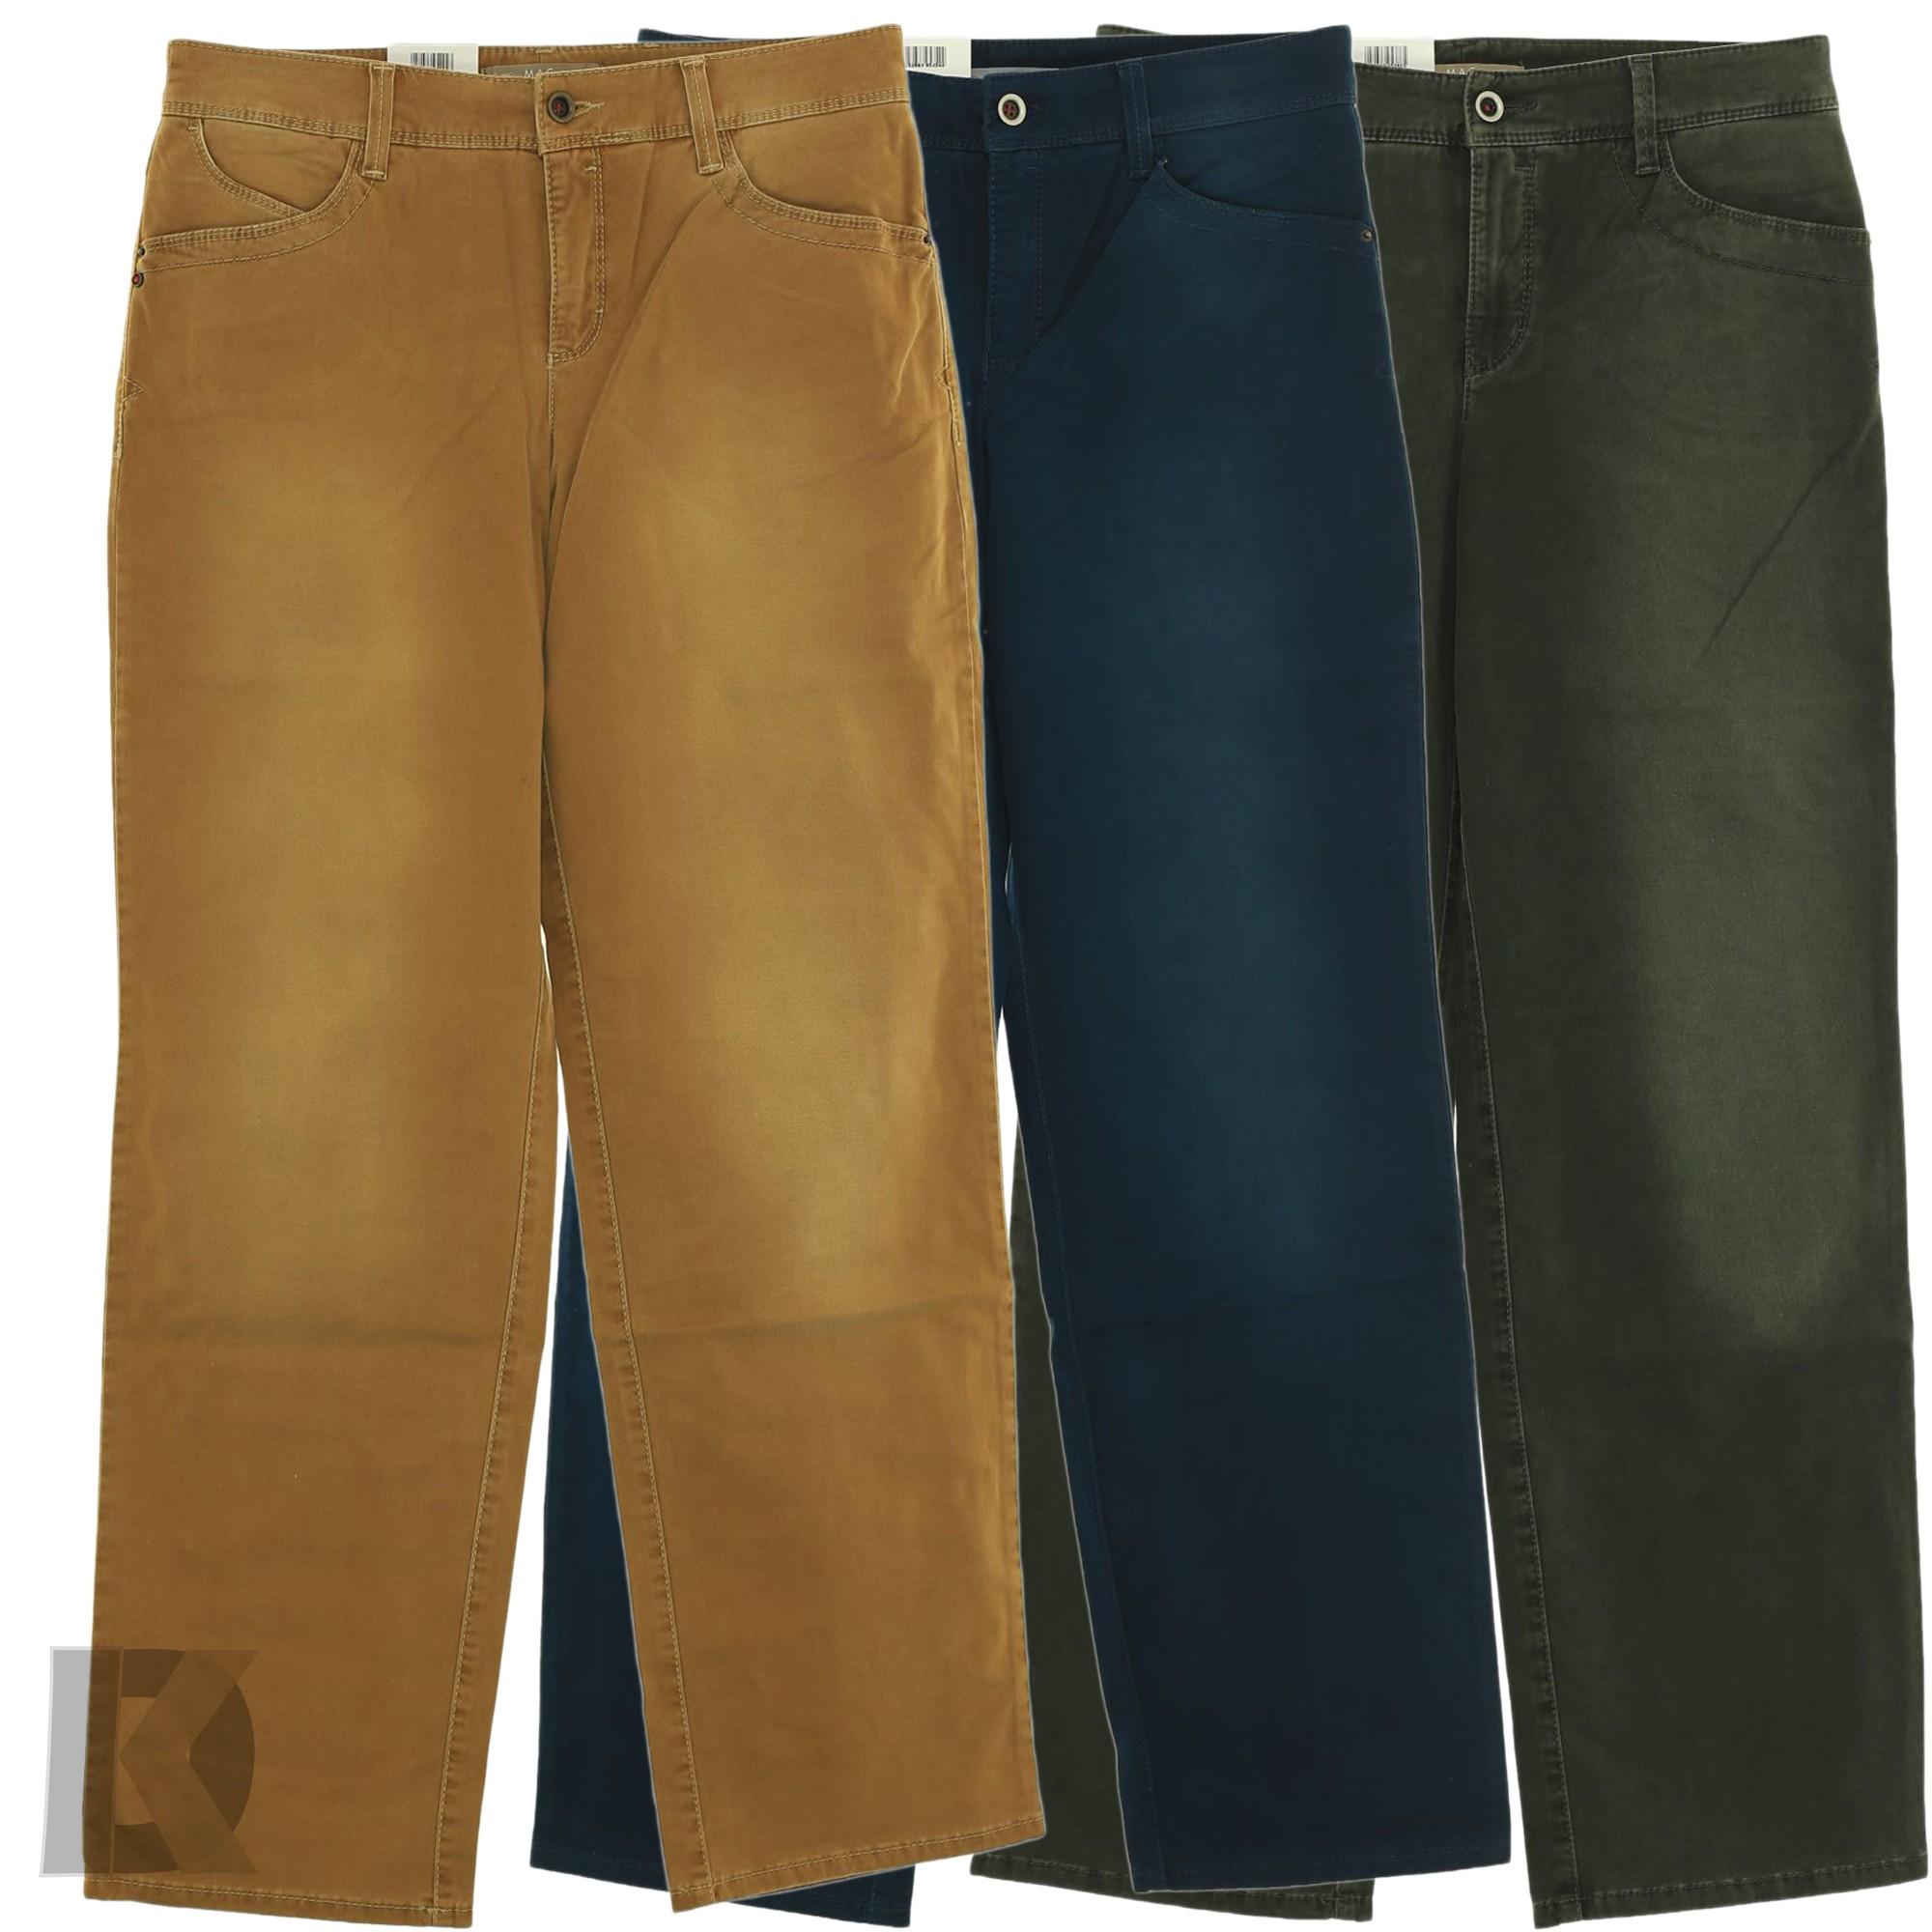 mac jeans gracia damen stretch gabardine feminine fit ebay. Black Bedroom Furniture Sets. Home Design Ideas